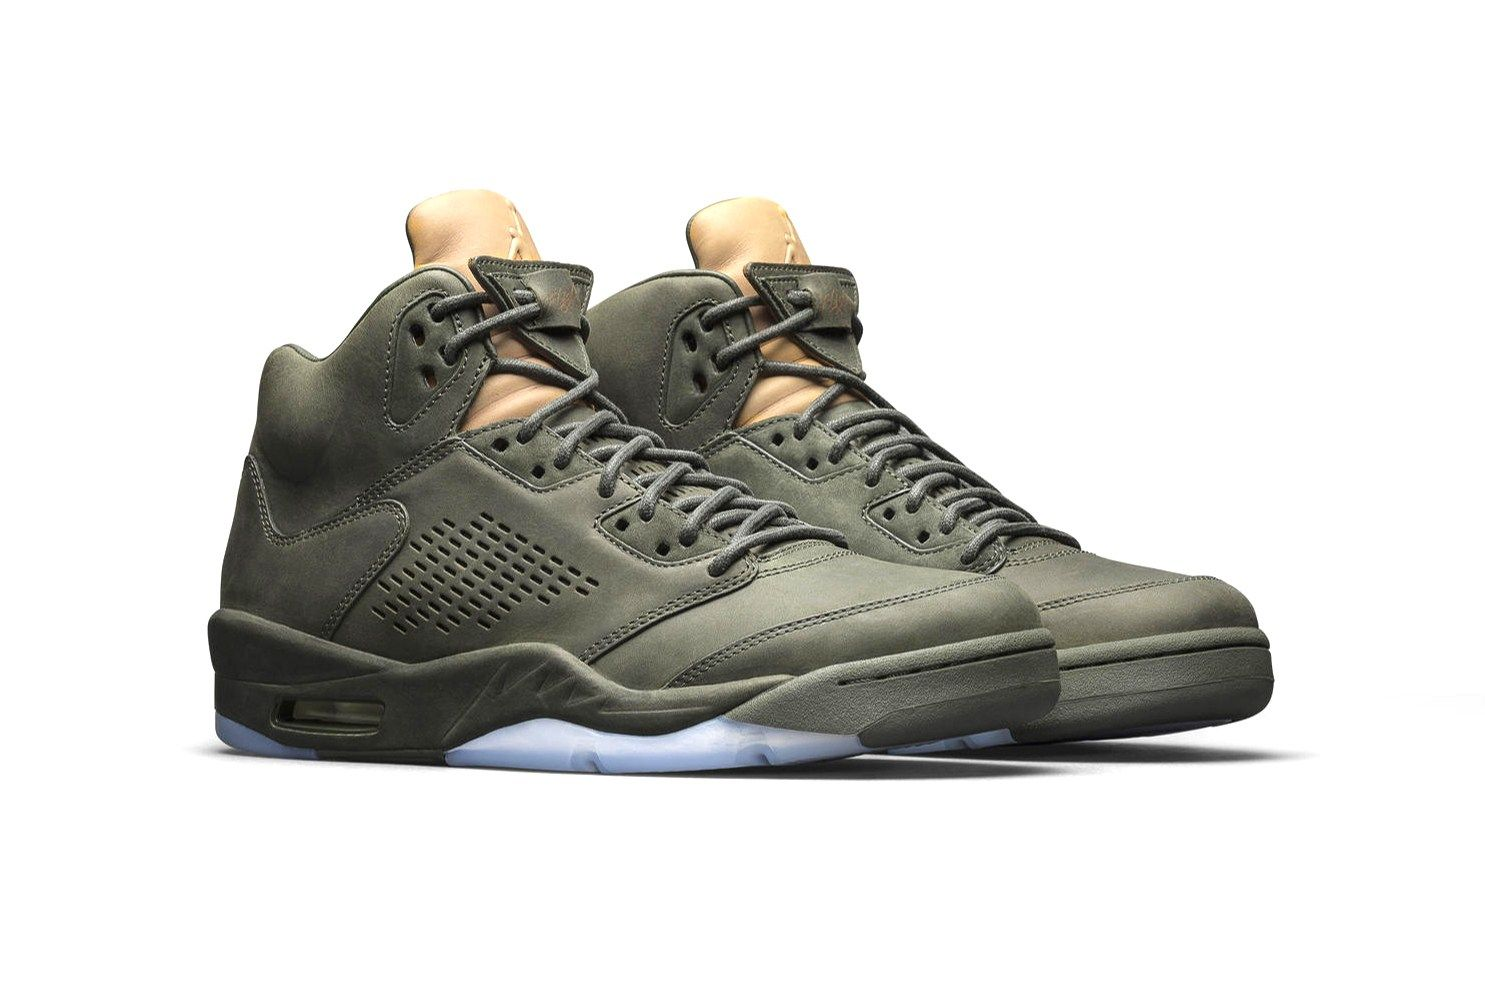 5eb5d6aeb27304 Jordan Brand Officially Unveils The